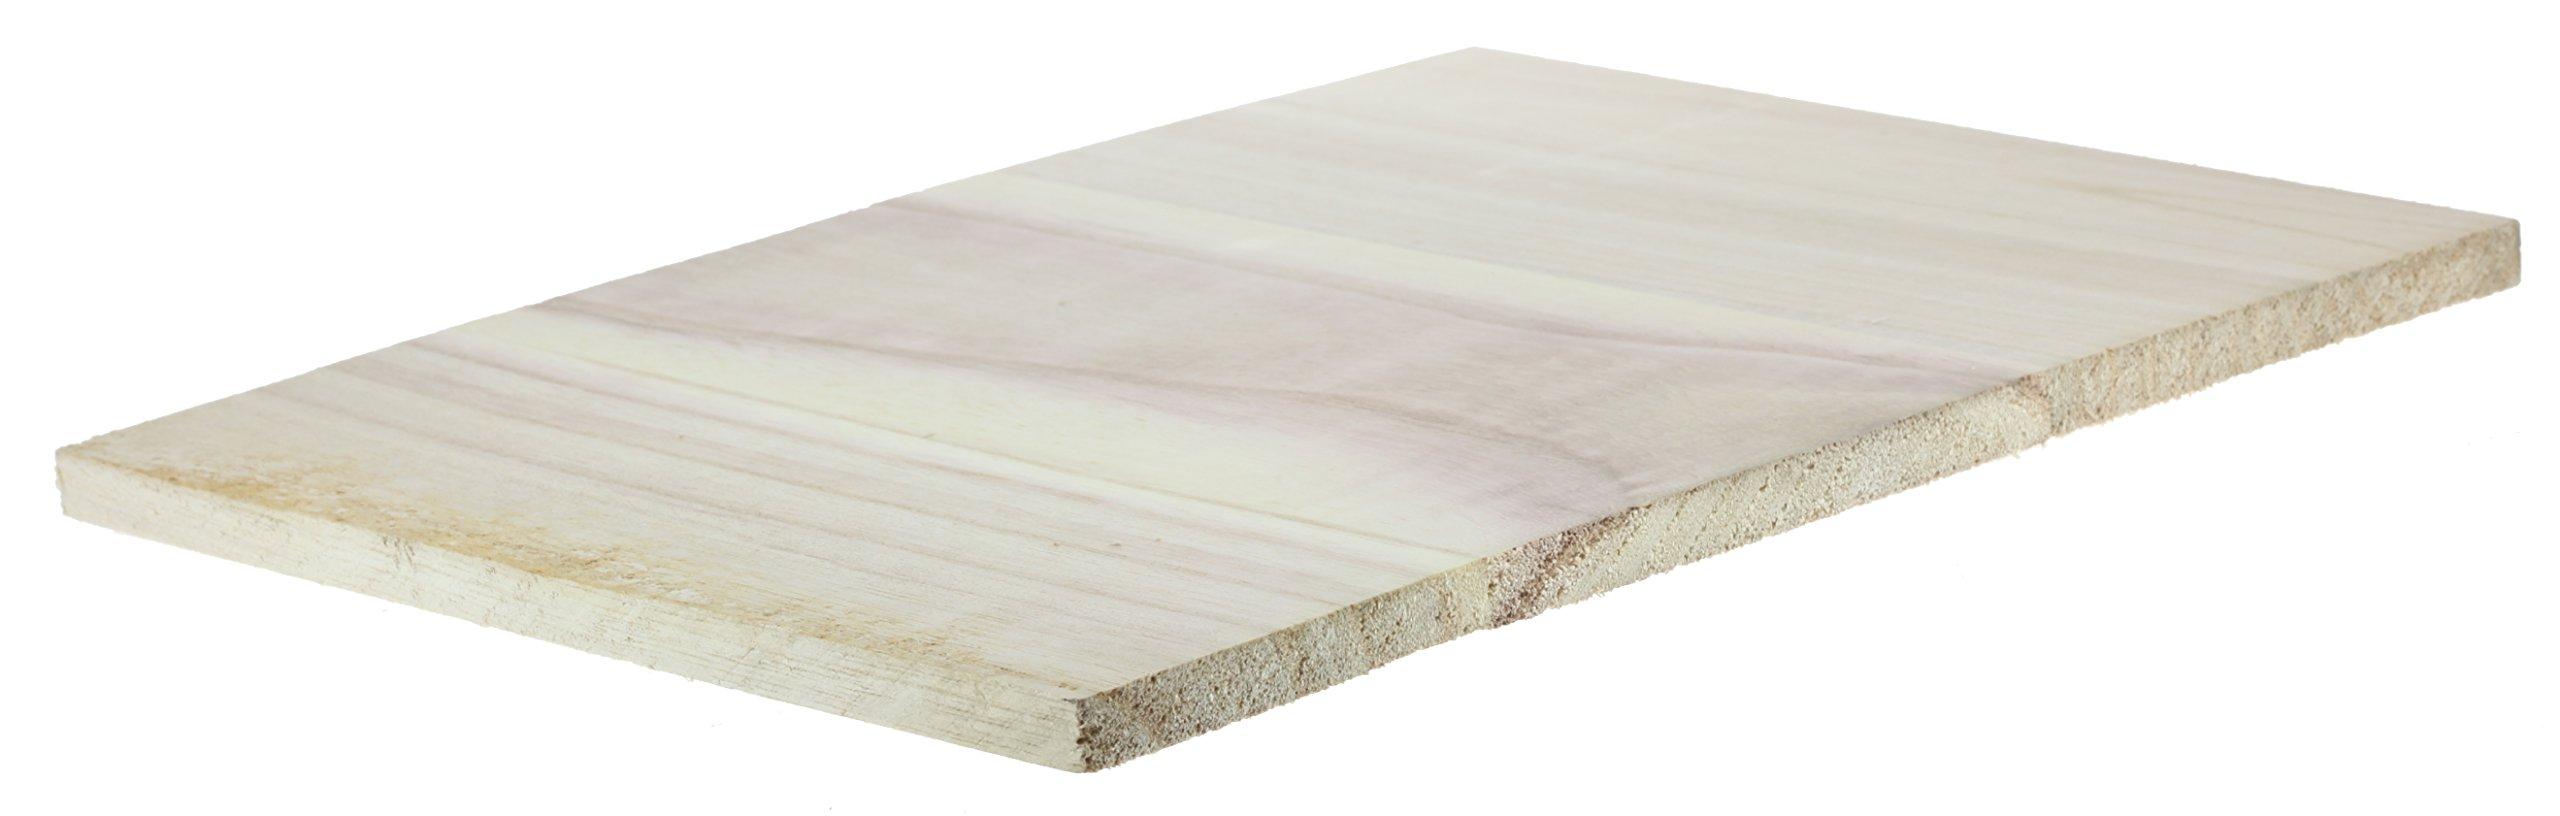 Tiger Claw 12mm Wood Board